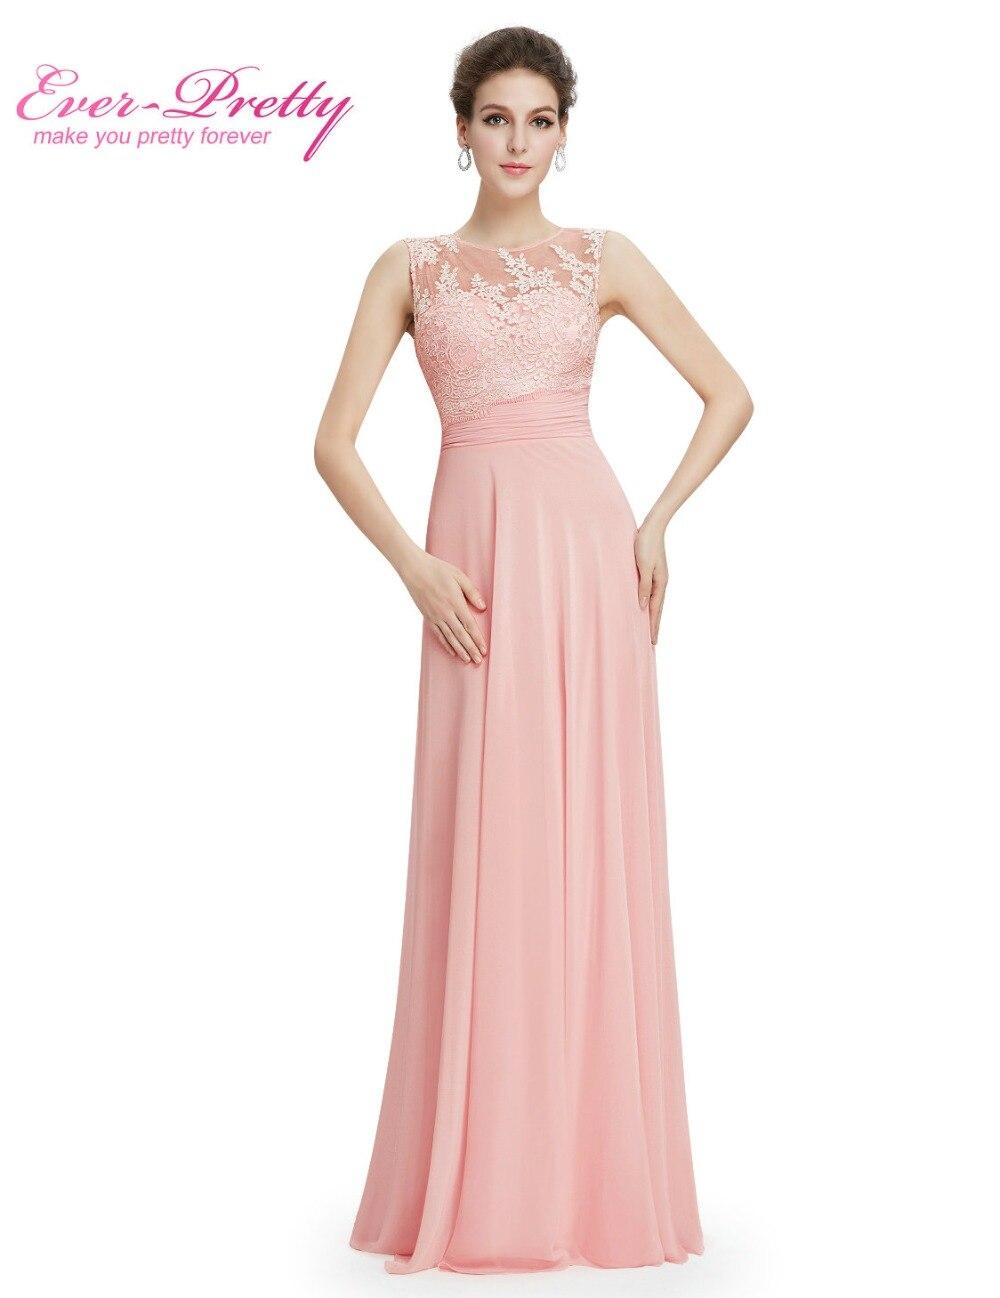 Light Pink Chiffon Dress Promotion-Shop for Promotional Light Pink ...